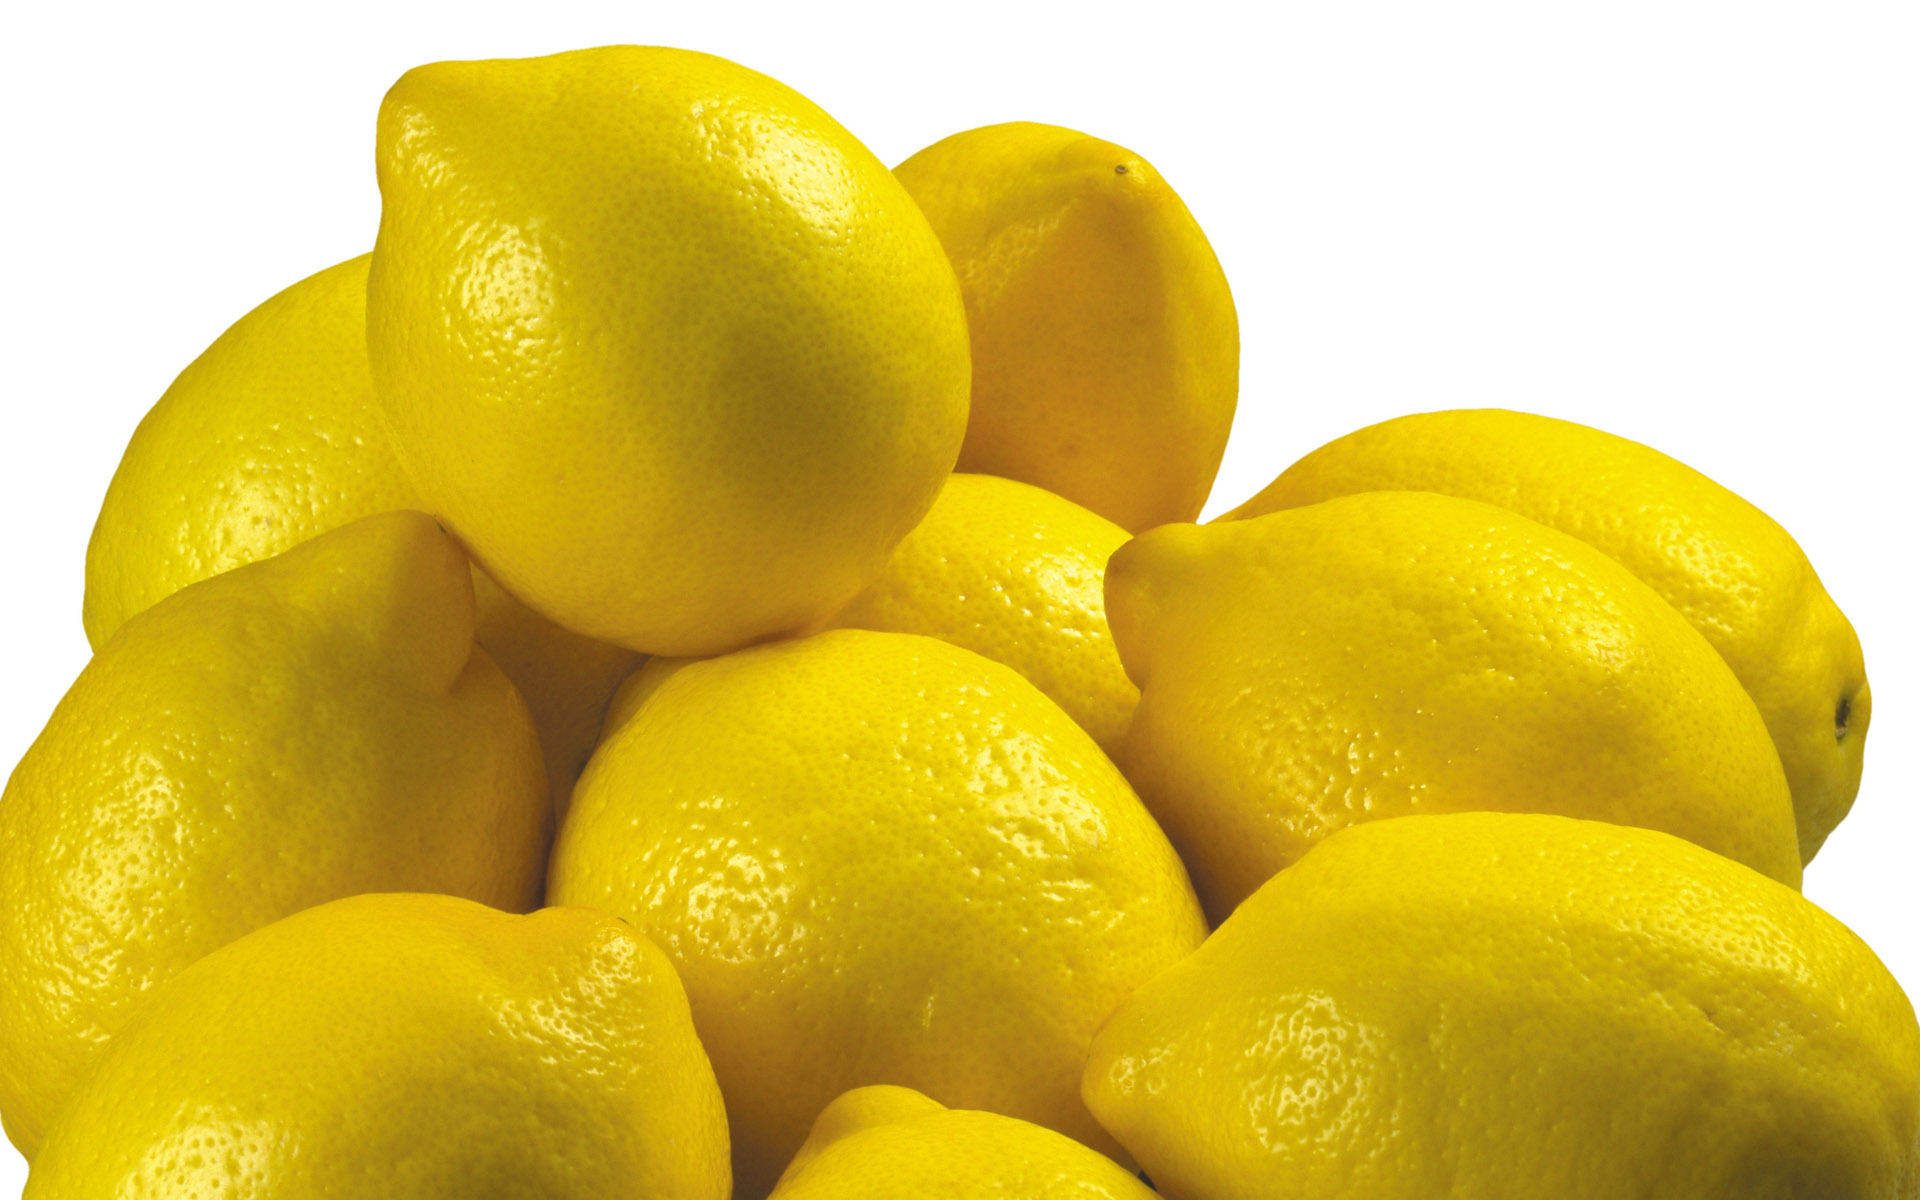 ... Lemon · Lemon · Lemon · Lemon